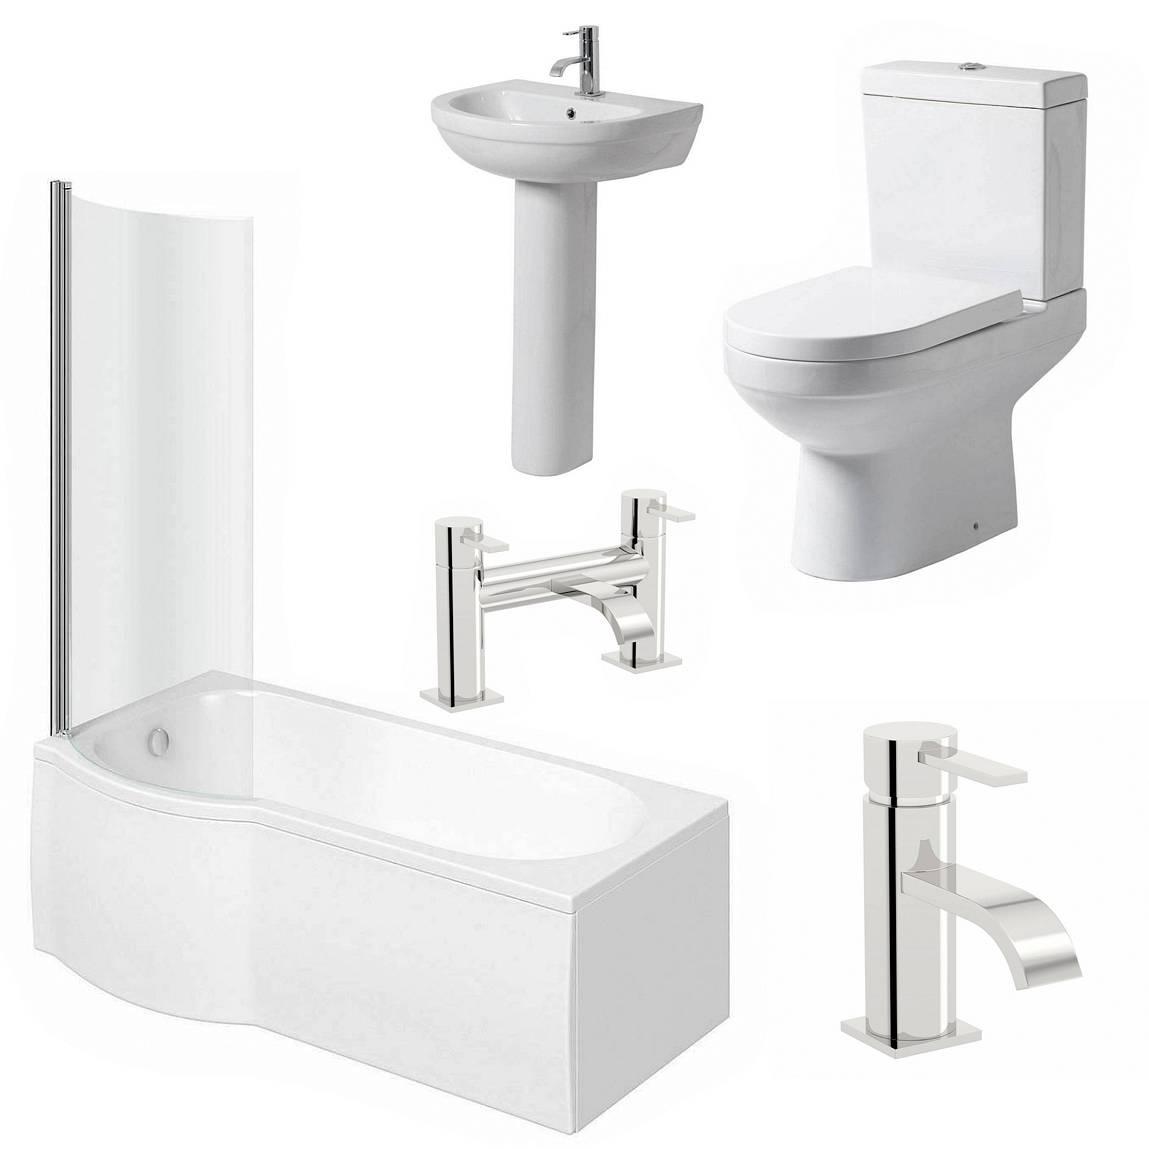 Image of Balance Complete Bathroom Suite LH